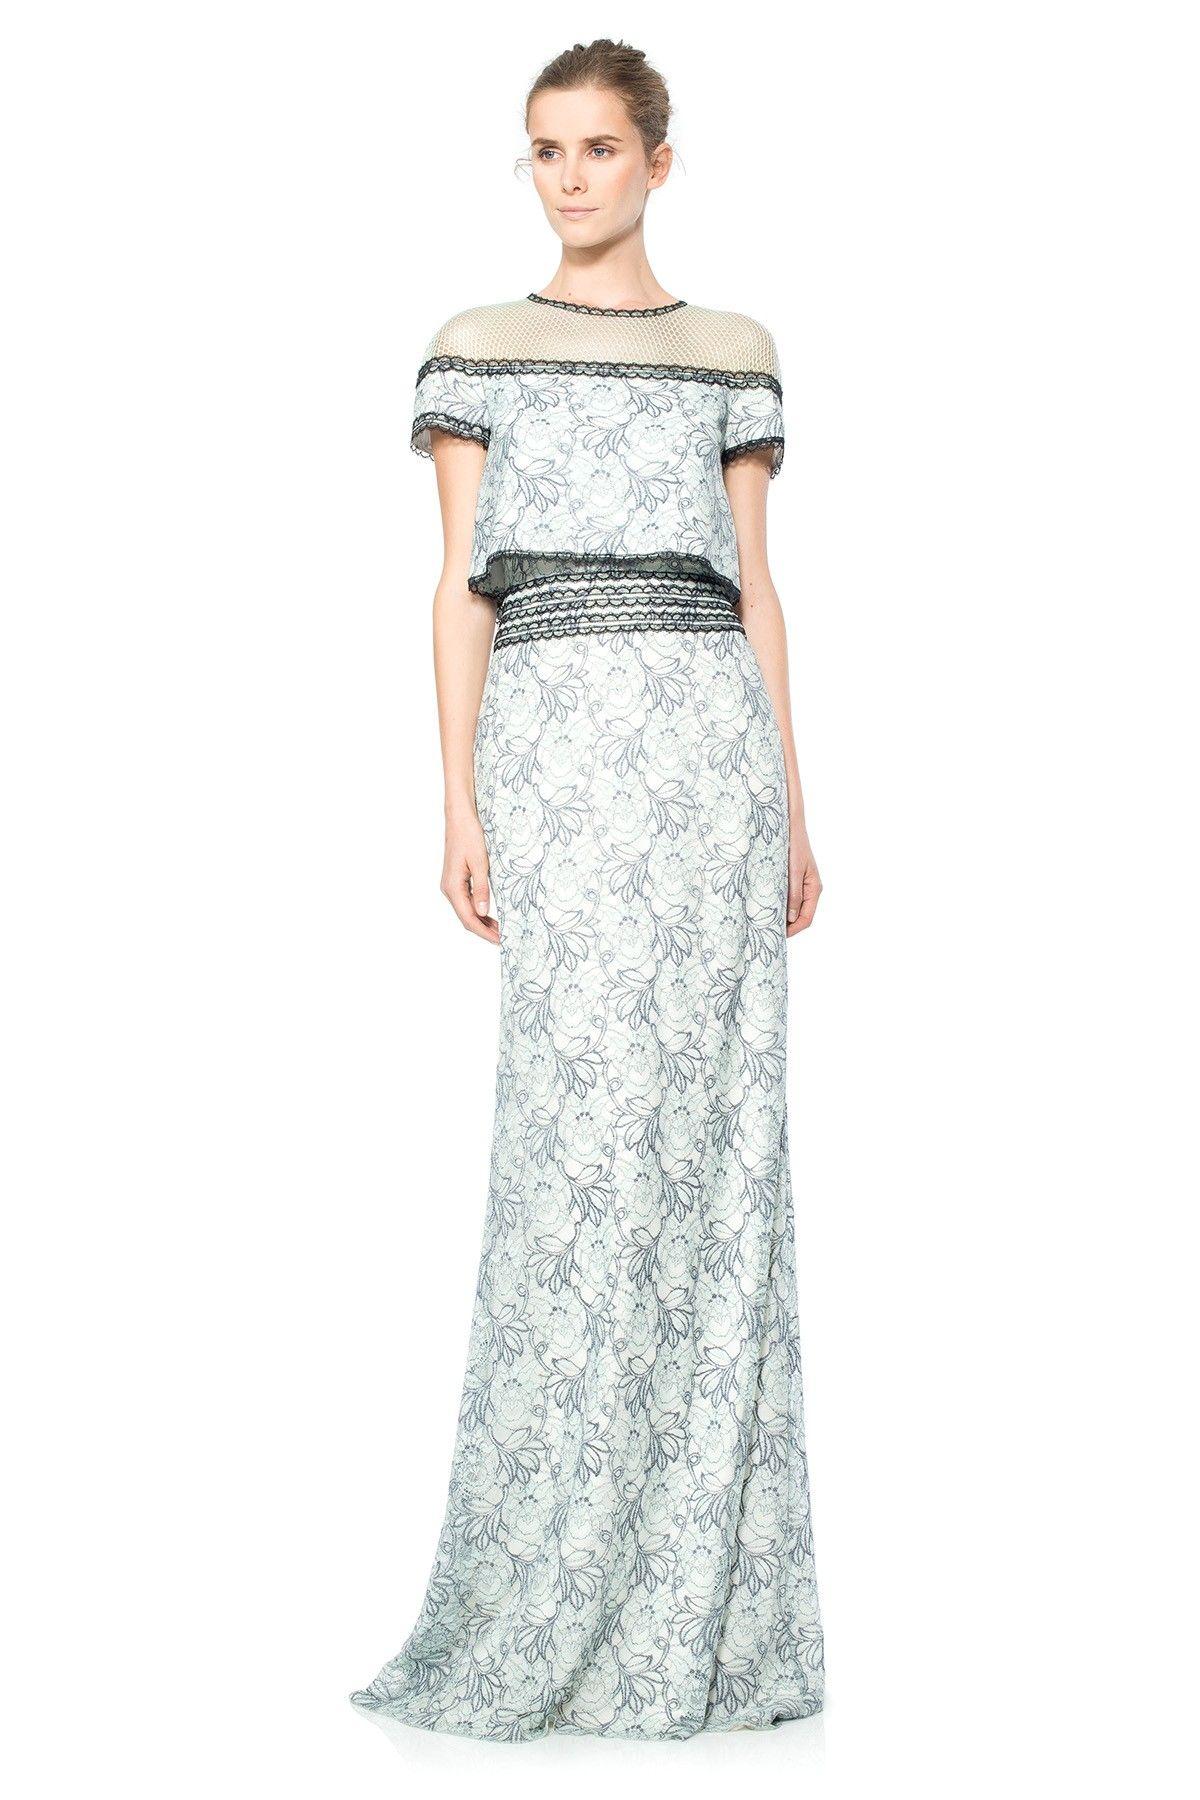 Tadashi shoji wedding guest dresses  Floral Chiffon Lace Crop Top Gown  Tadashi Shoji  Gown  Pinterest